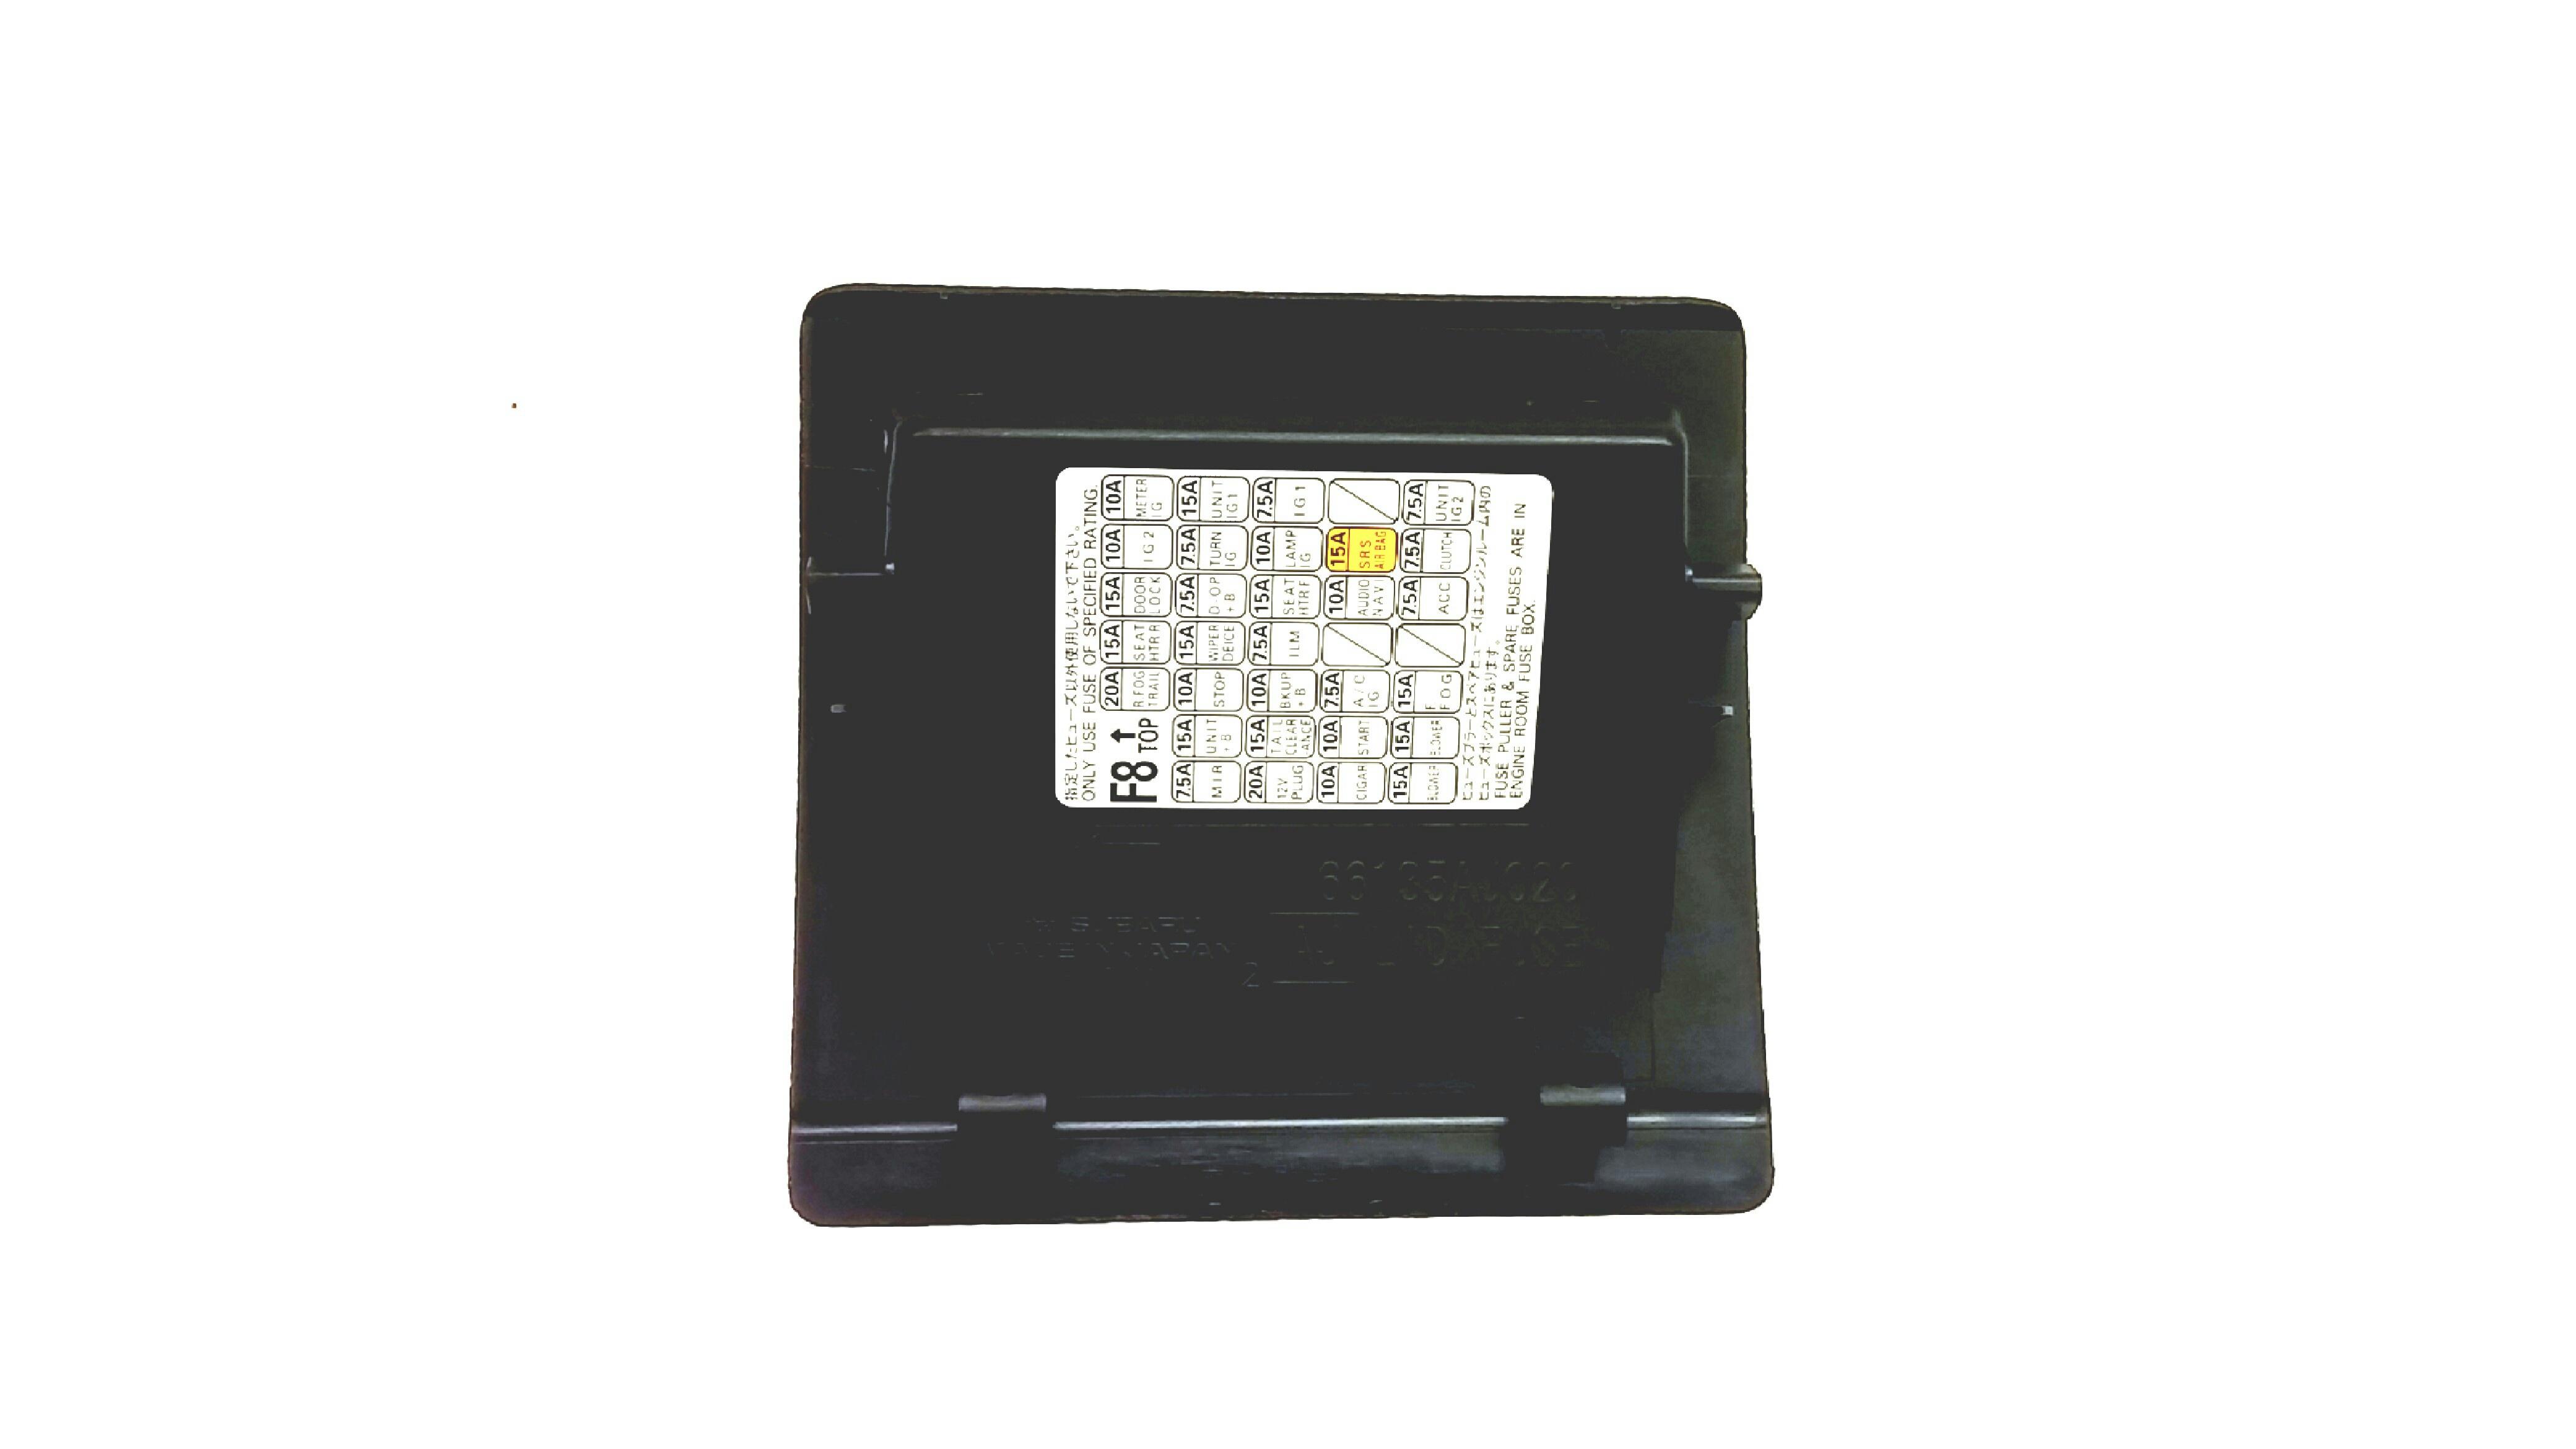 Subaru Crosstrek Fuse Box Manual Of Wiring Diagram 2013 Impreza Lid Assembly Panel Interior